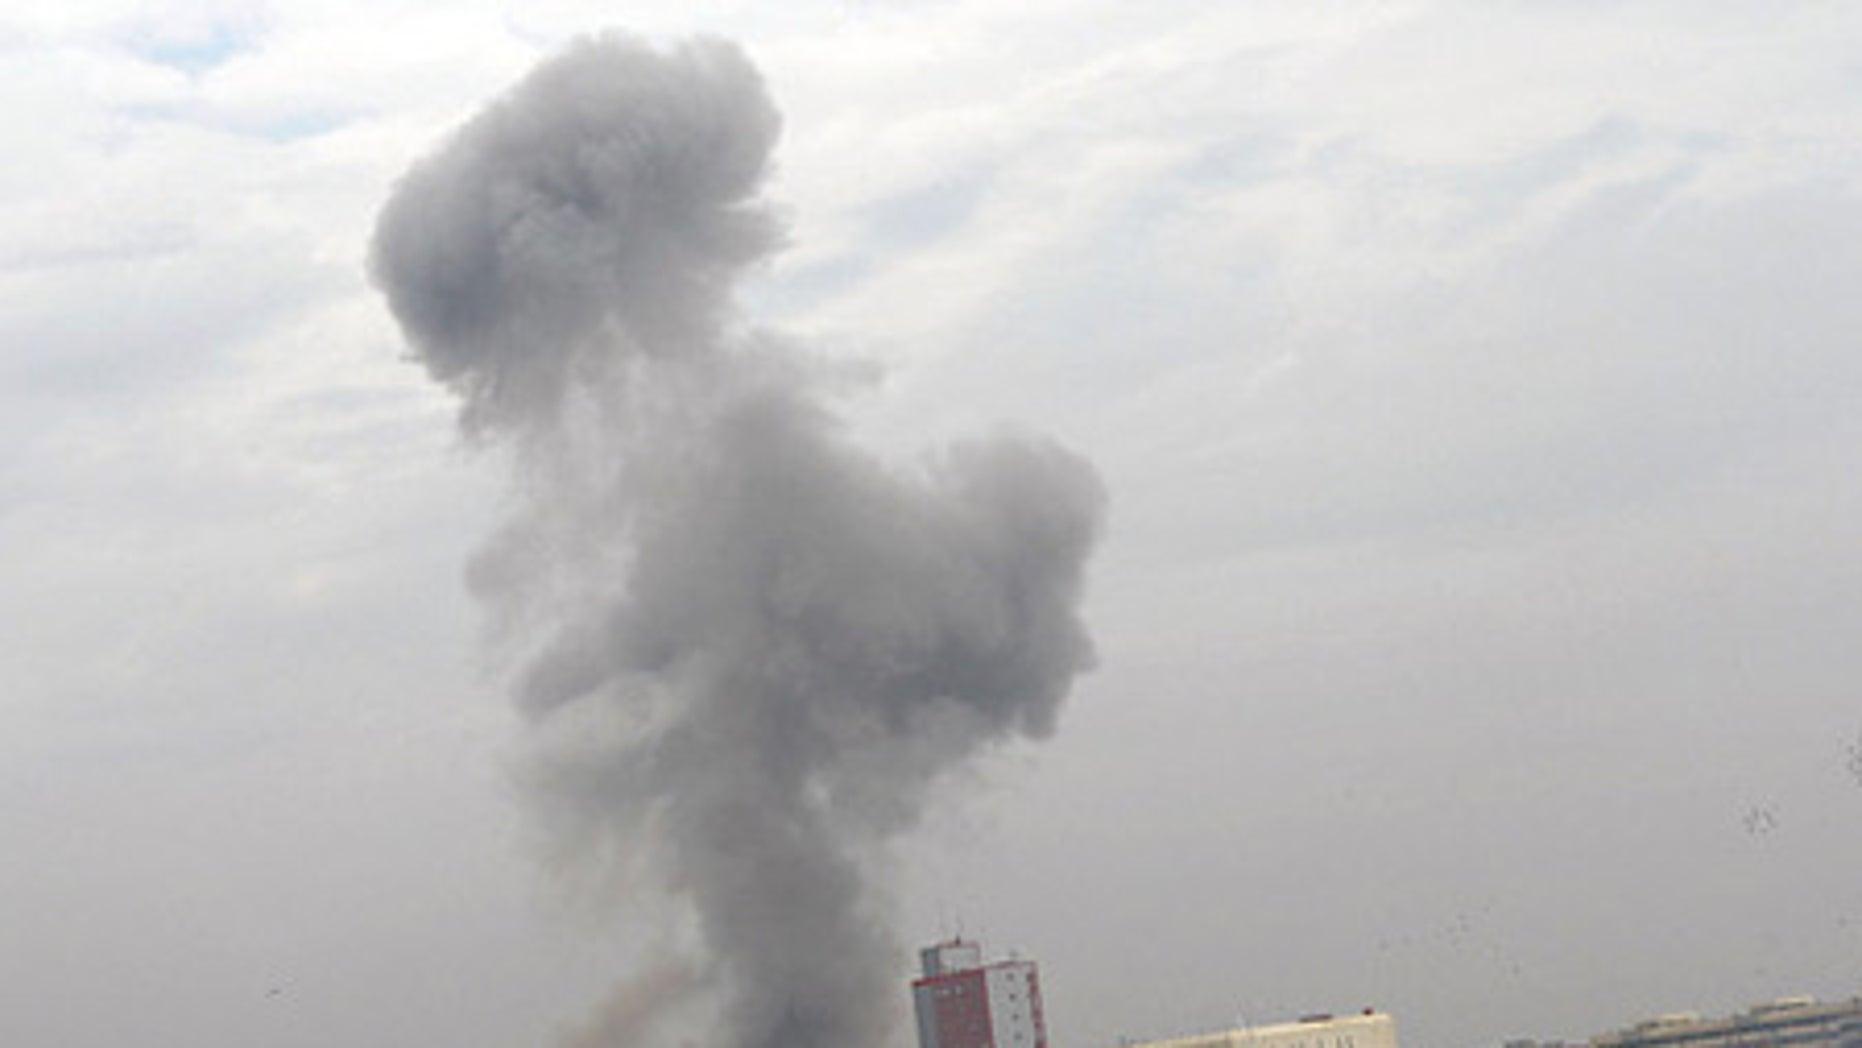 Dec. 8: Smoke billows following a deadly explosion in Baghdad, Iraq.